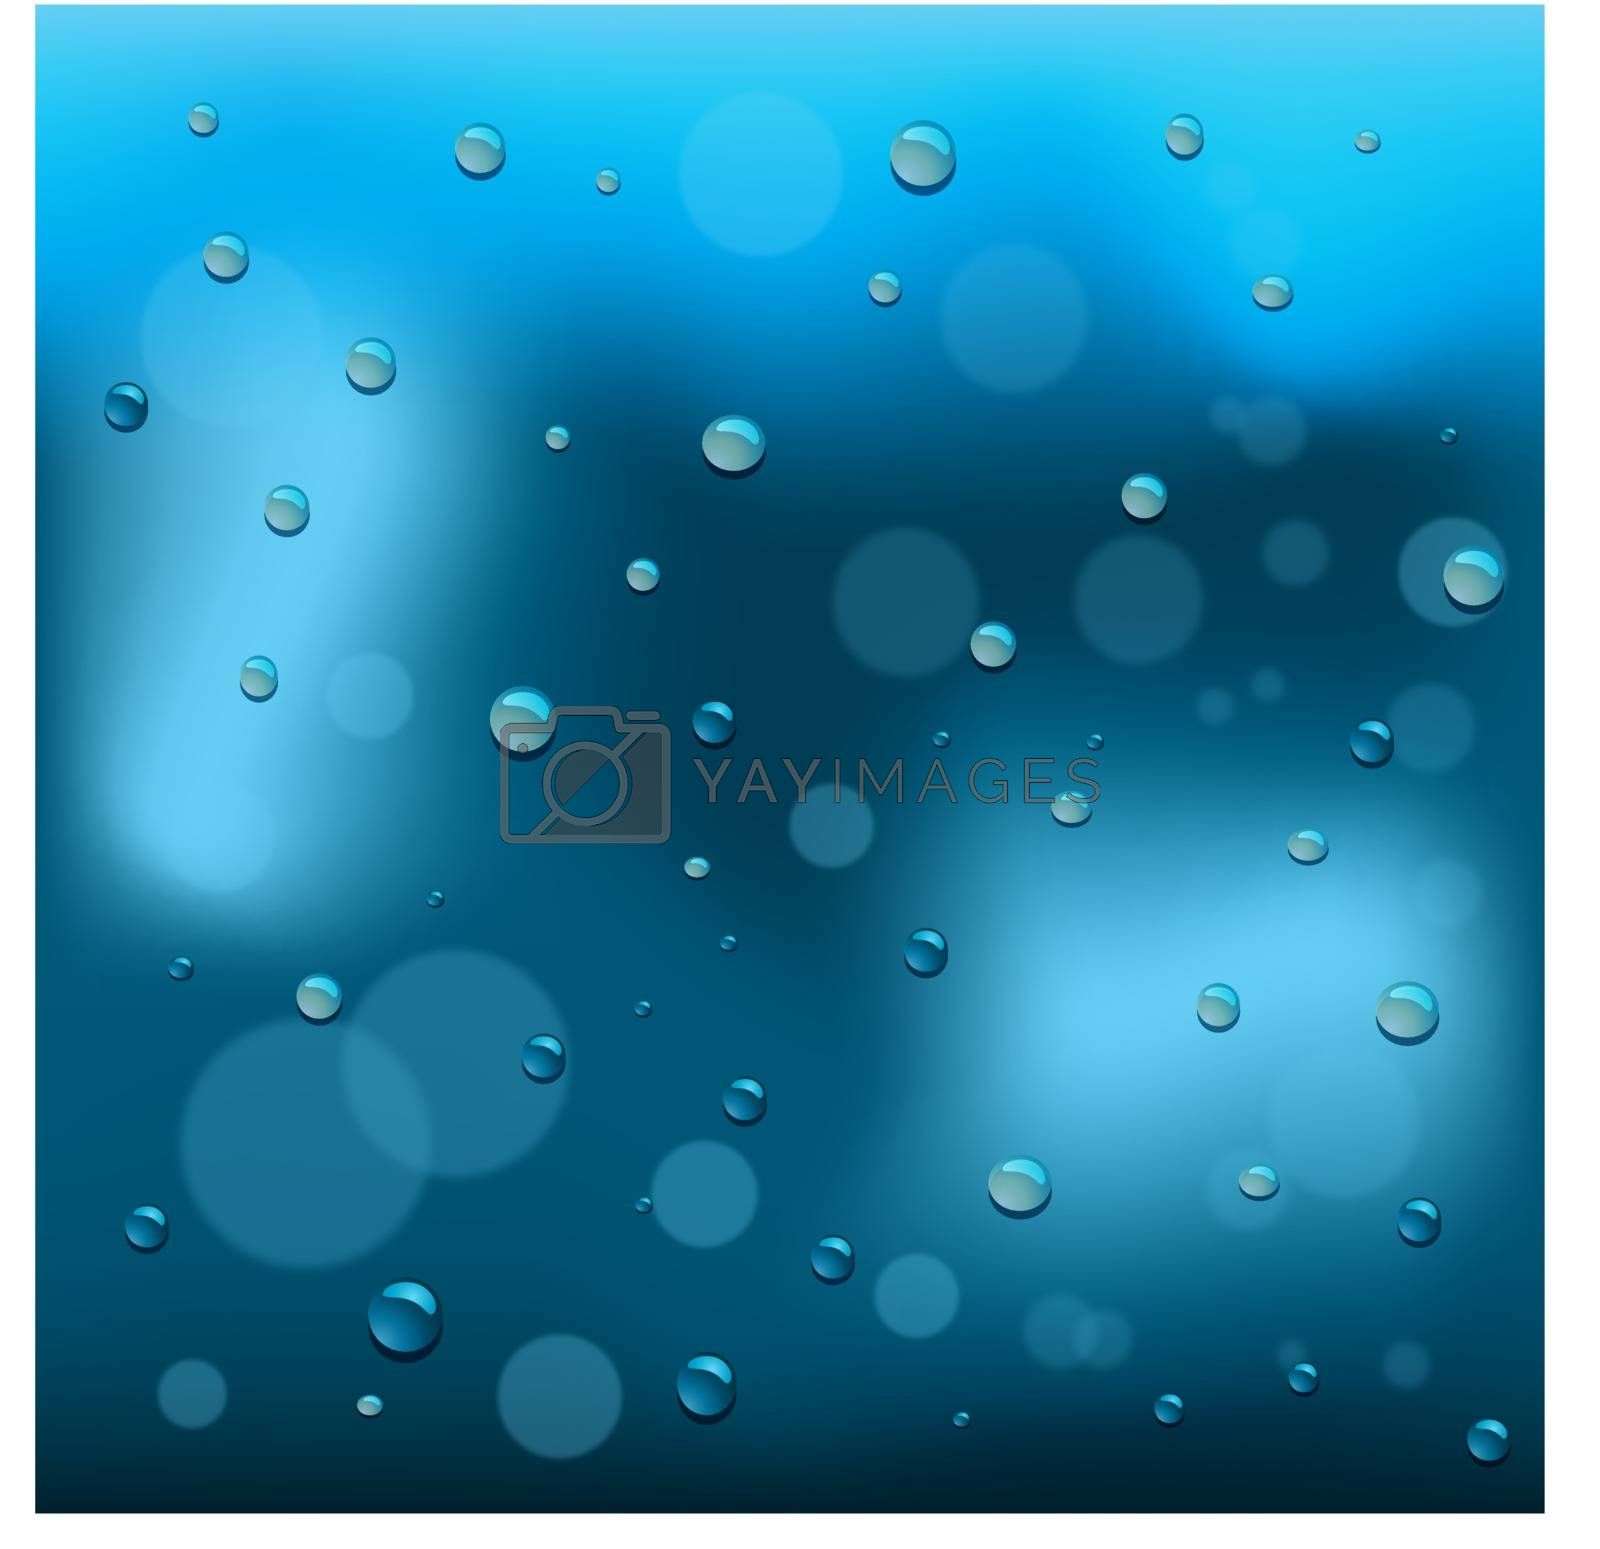 Rain drop on glass background, vector illustration